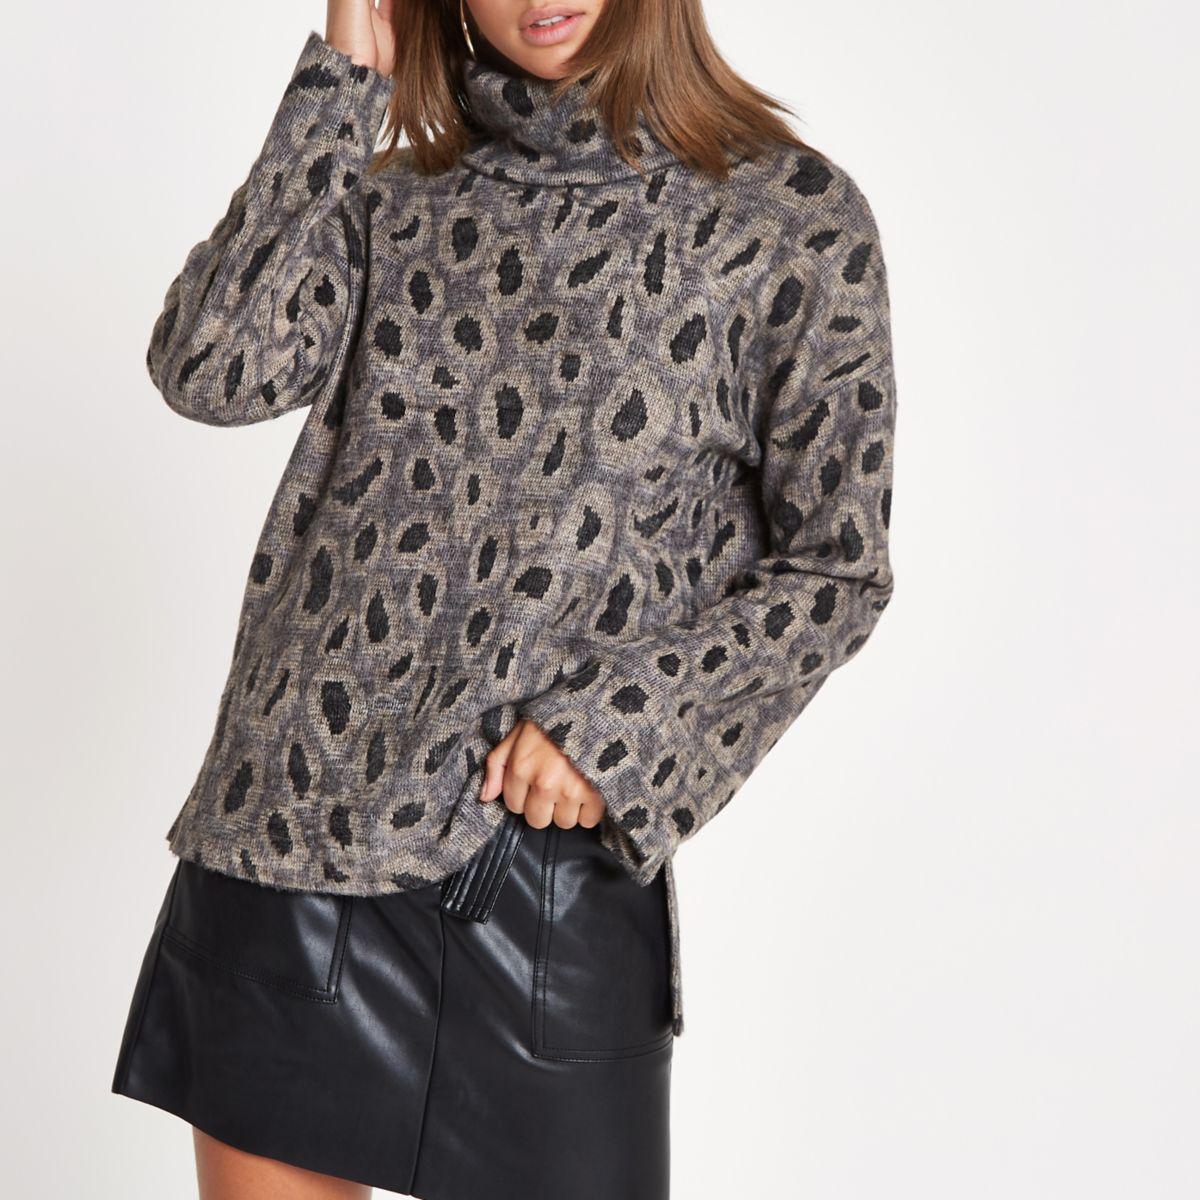 Brown brushed leopard print top